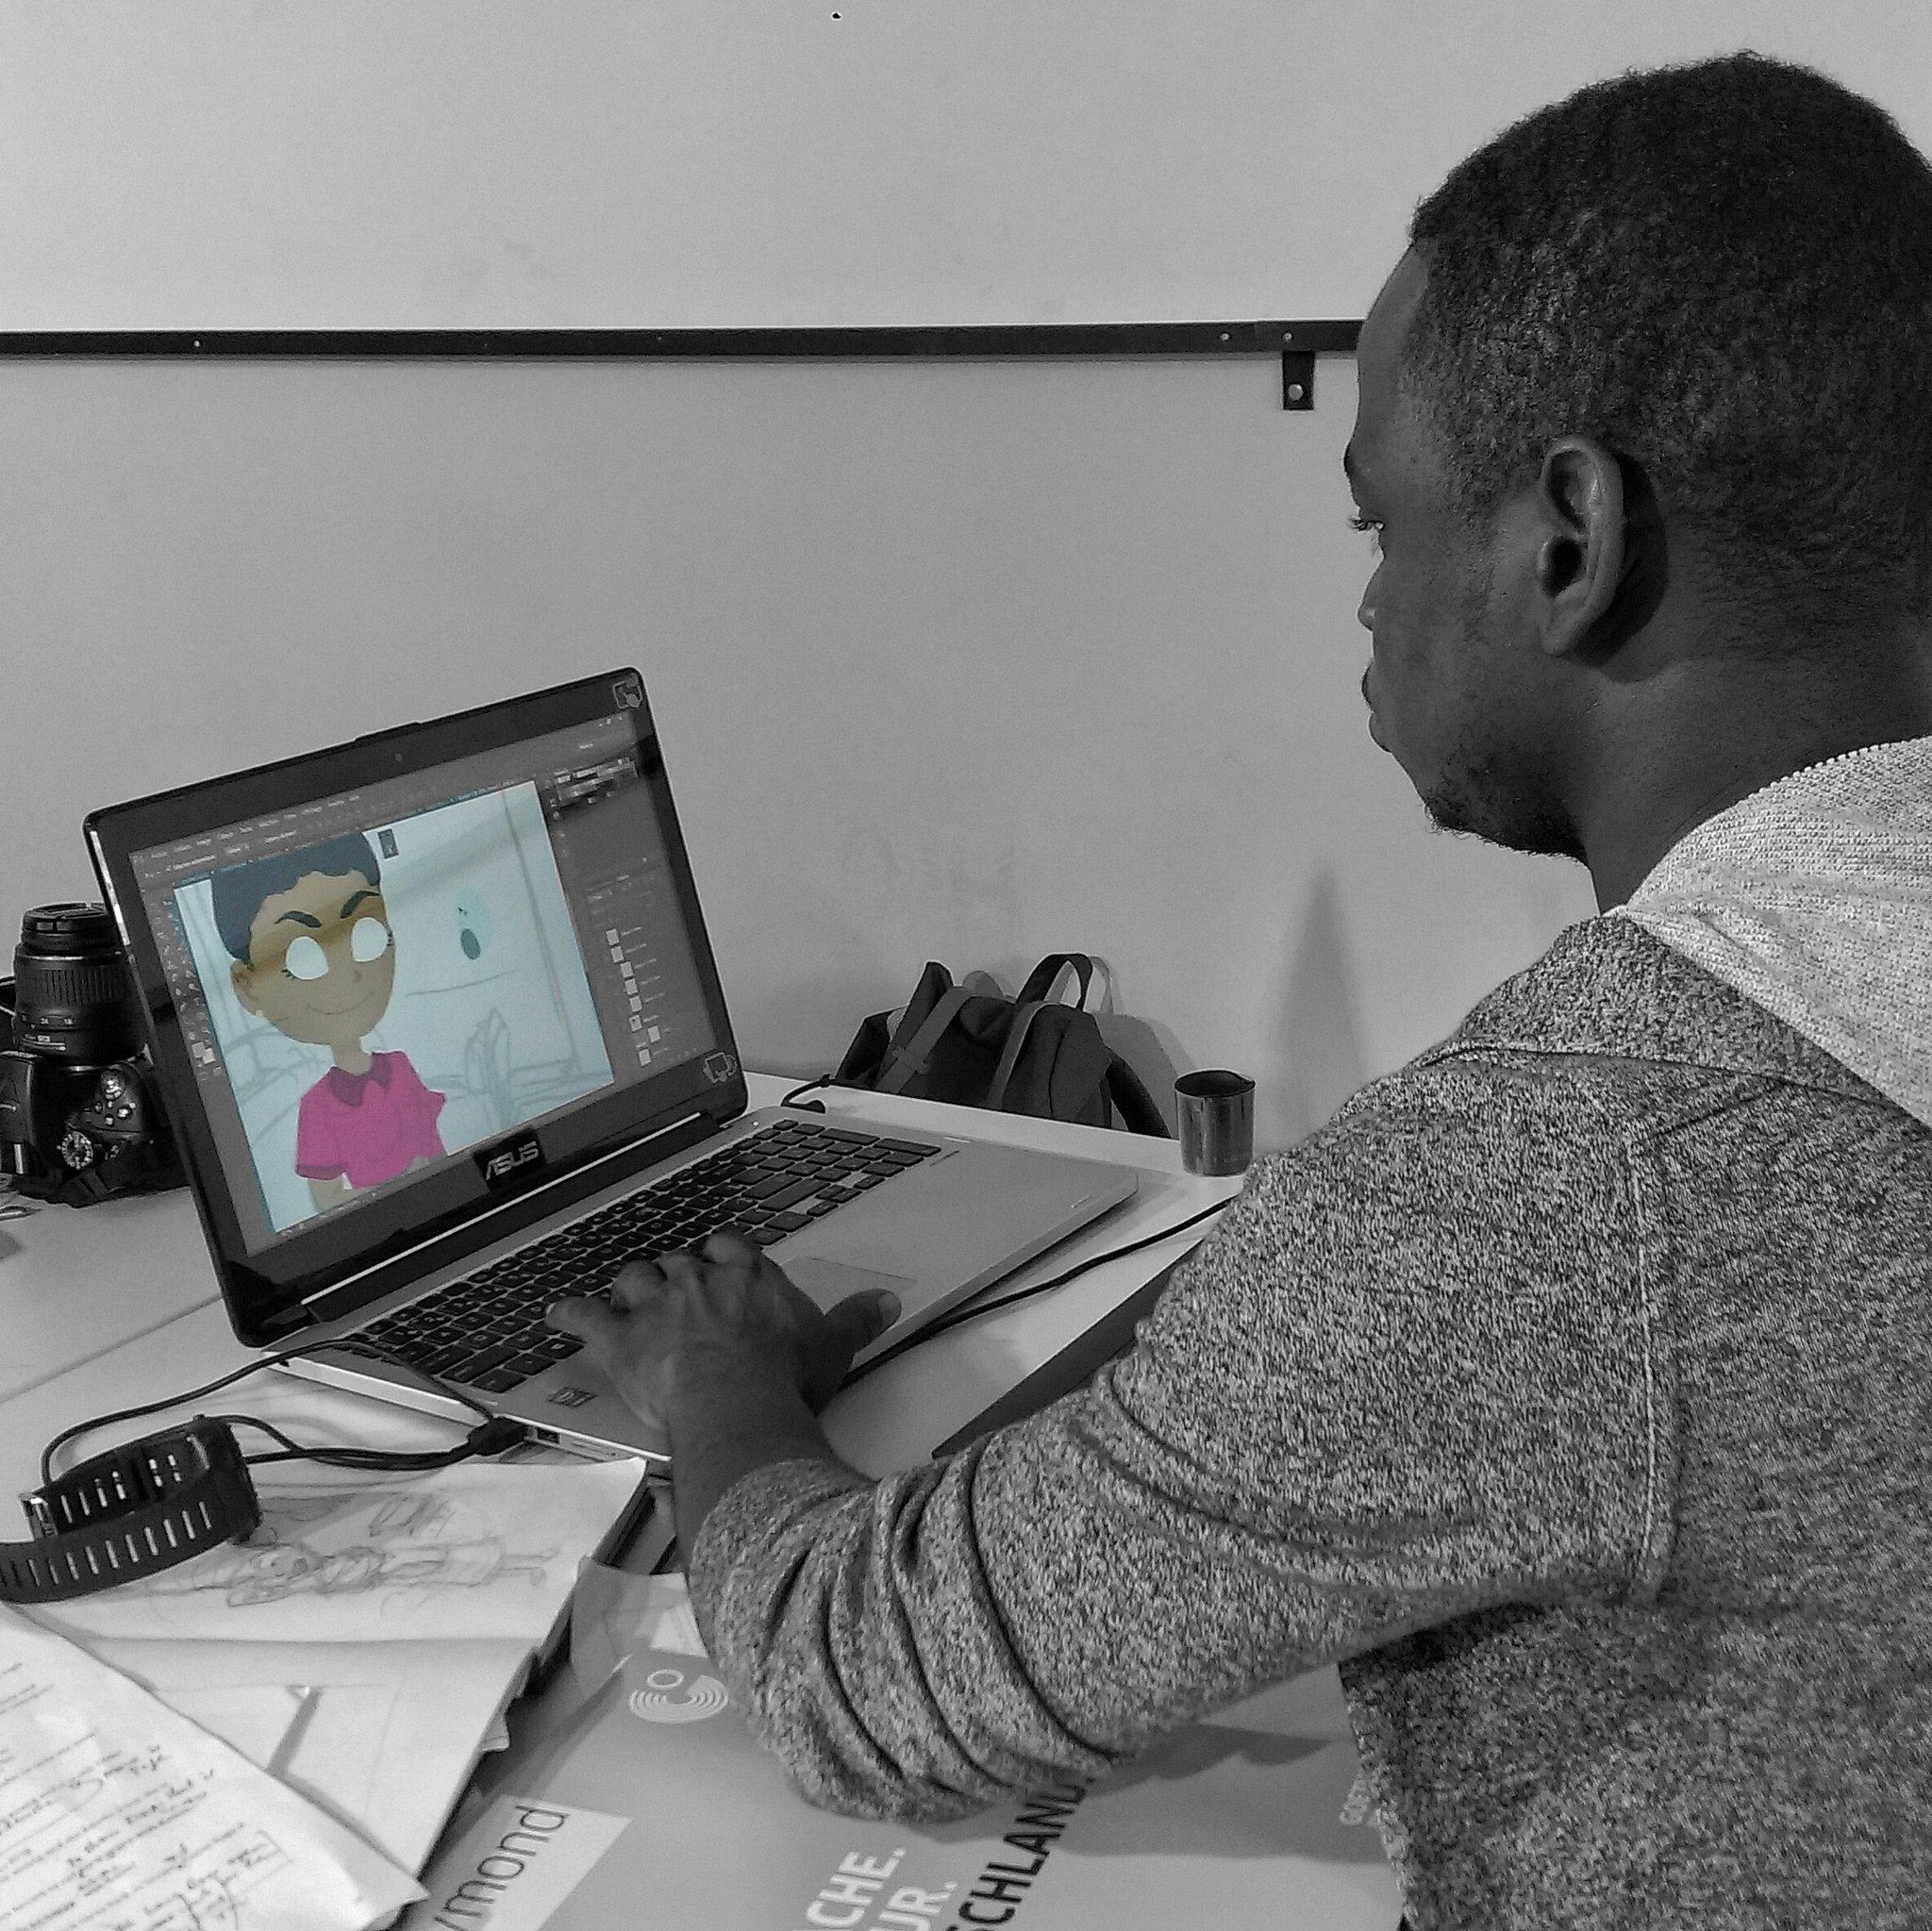 Ivorian illustrator Raymond Diby working on the children's book Miss Tiny Chef for @bookdash. #BookDash #BookDashPlus @worldreaders https://t.co/qhJN2Uo4QN